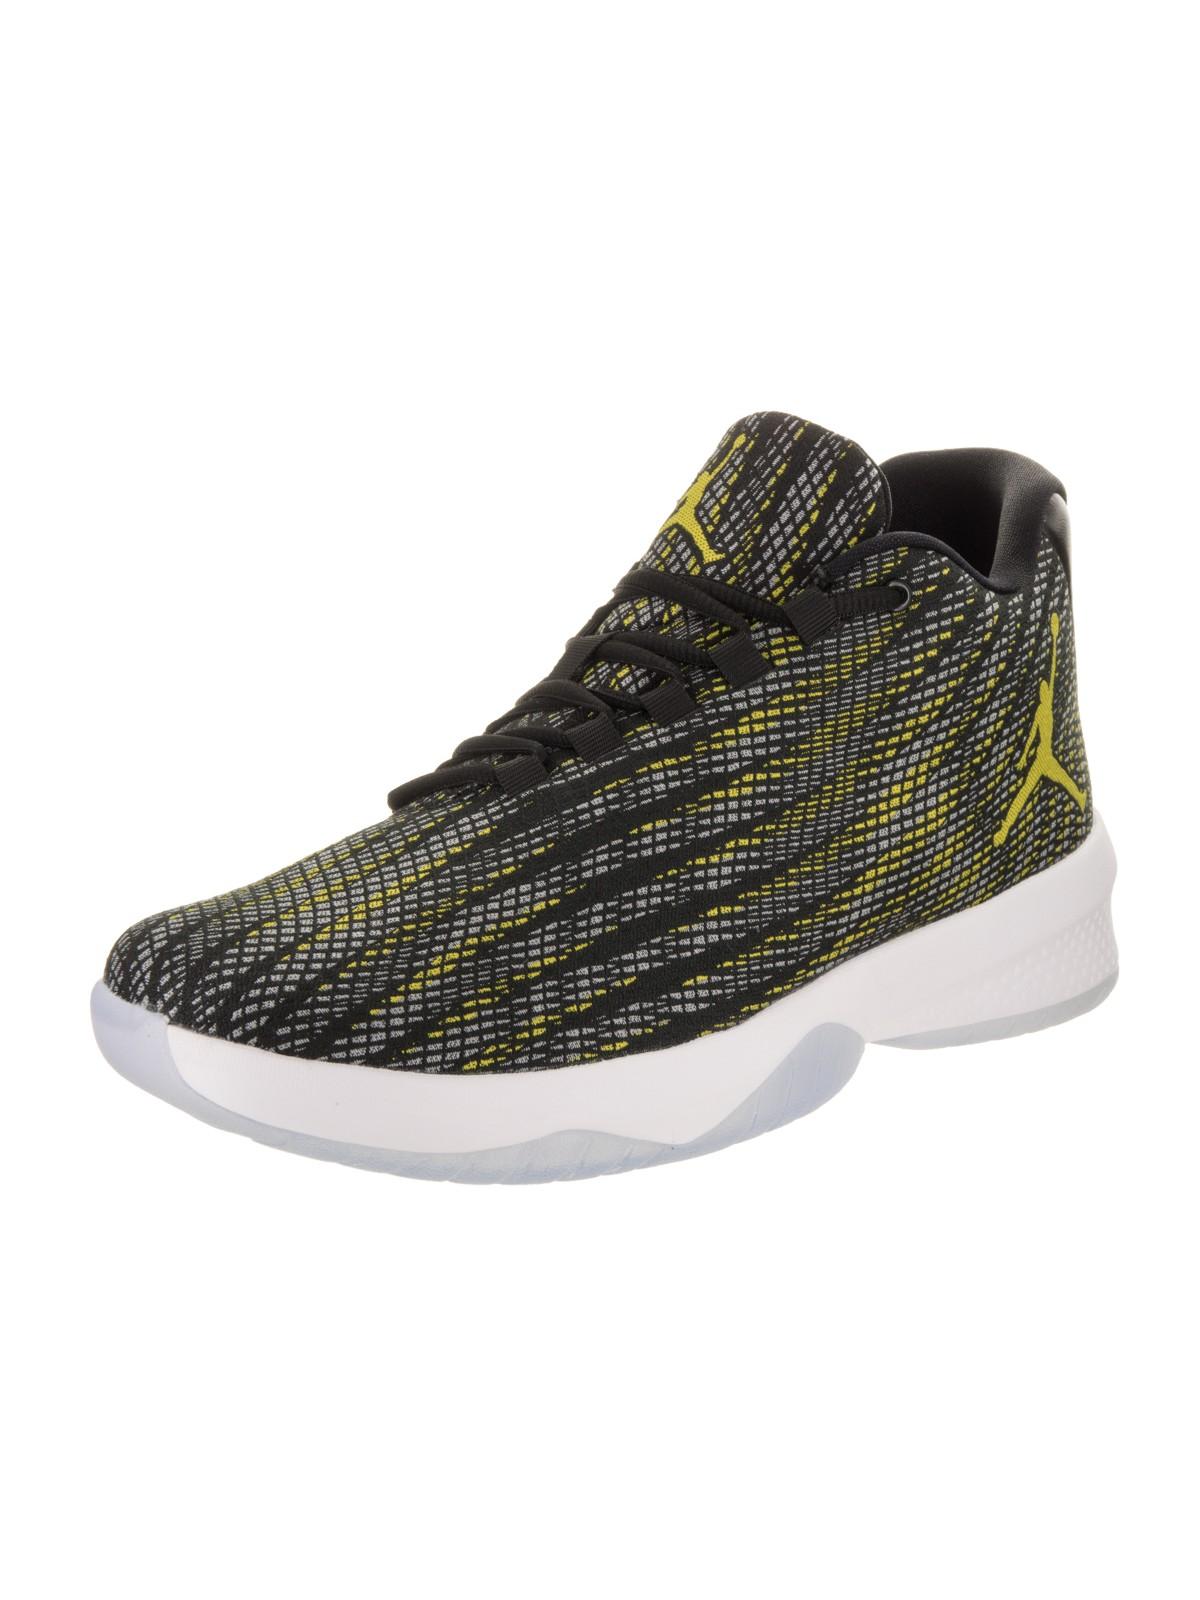 a31e722448f ... discount product image nike jordan mens jordan b. fly basketball shoe  25f06 e6f7a